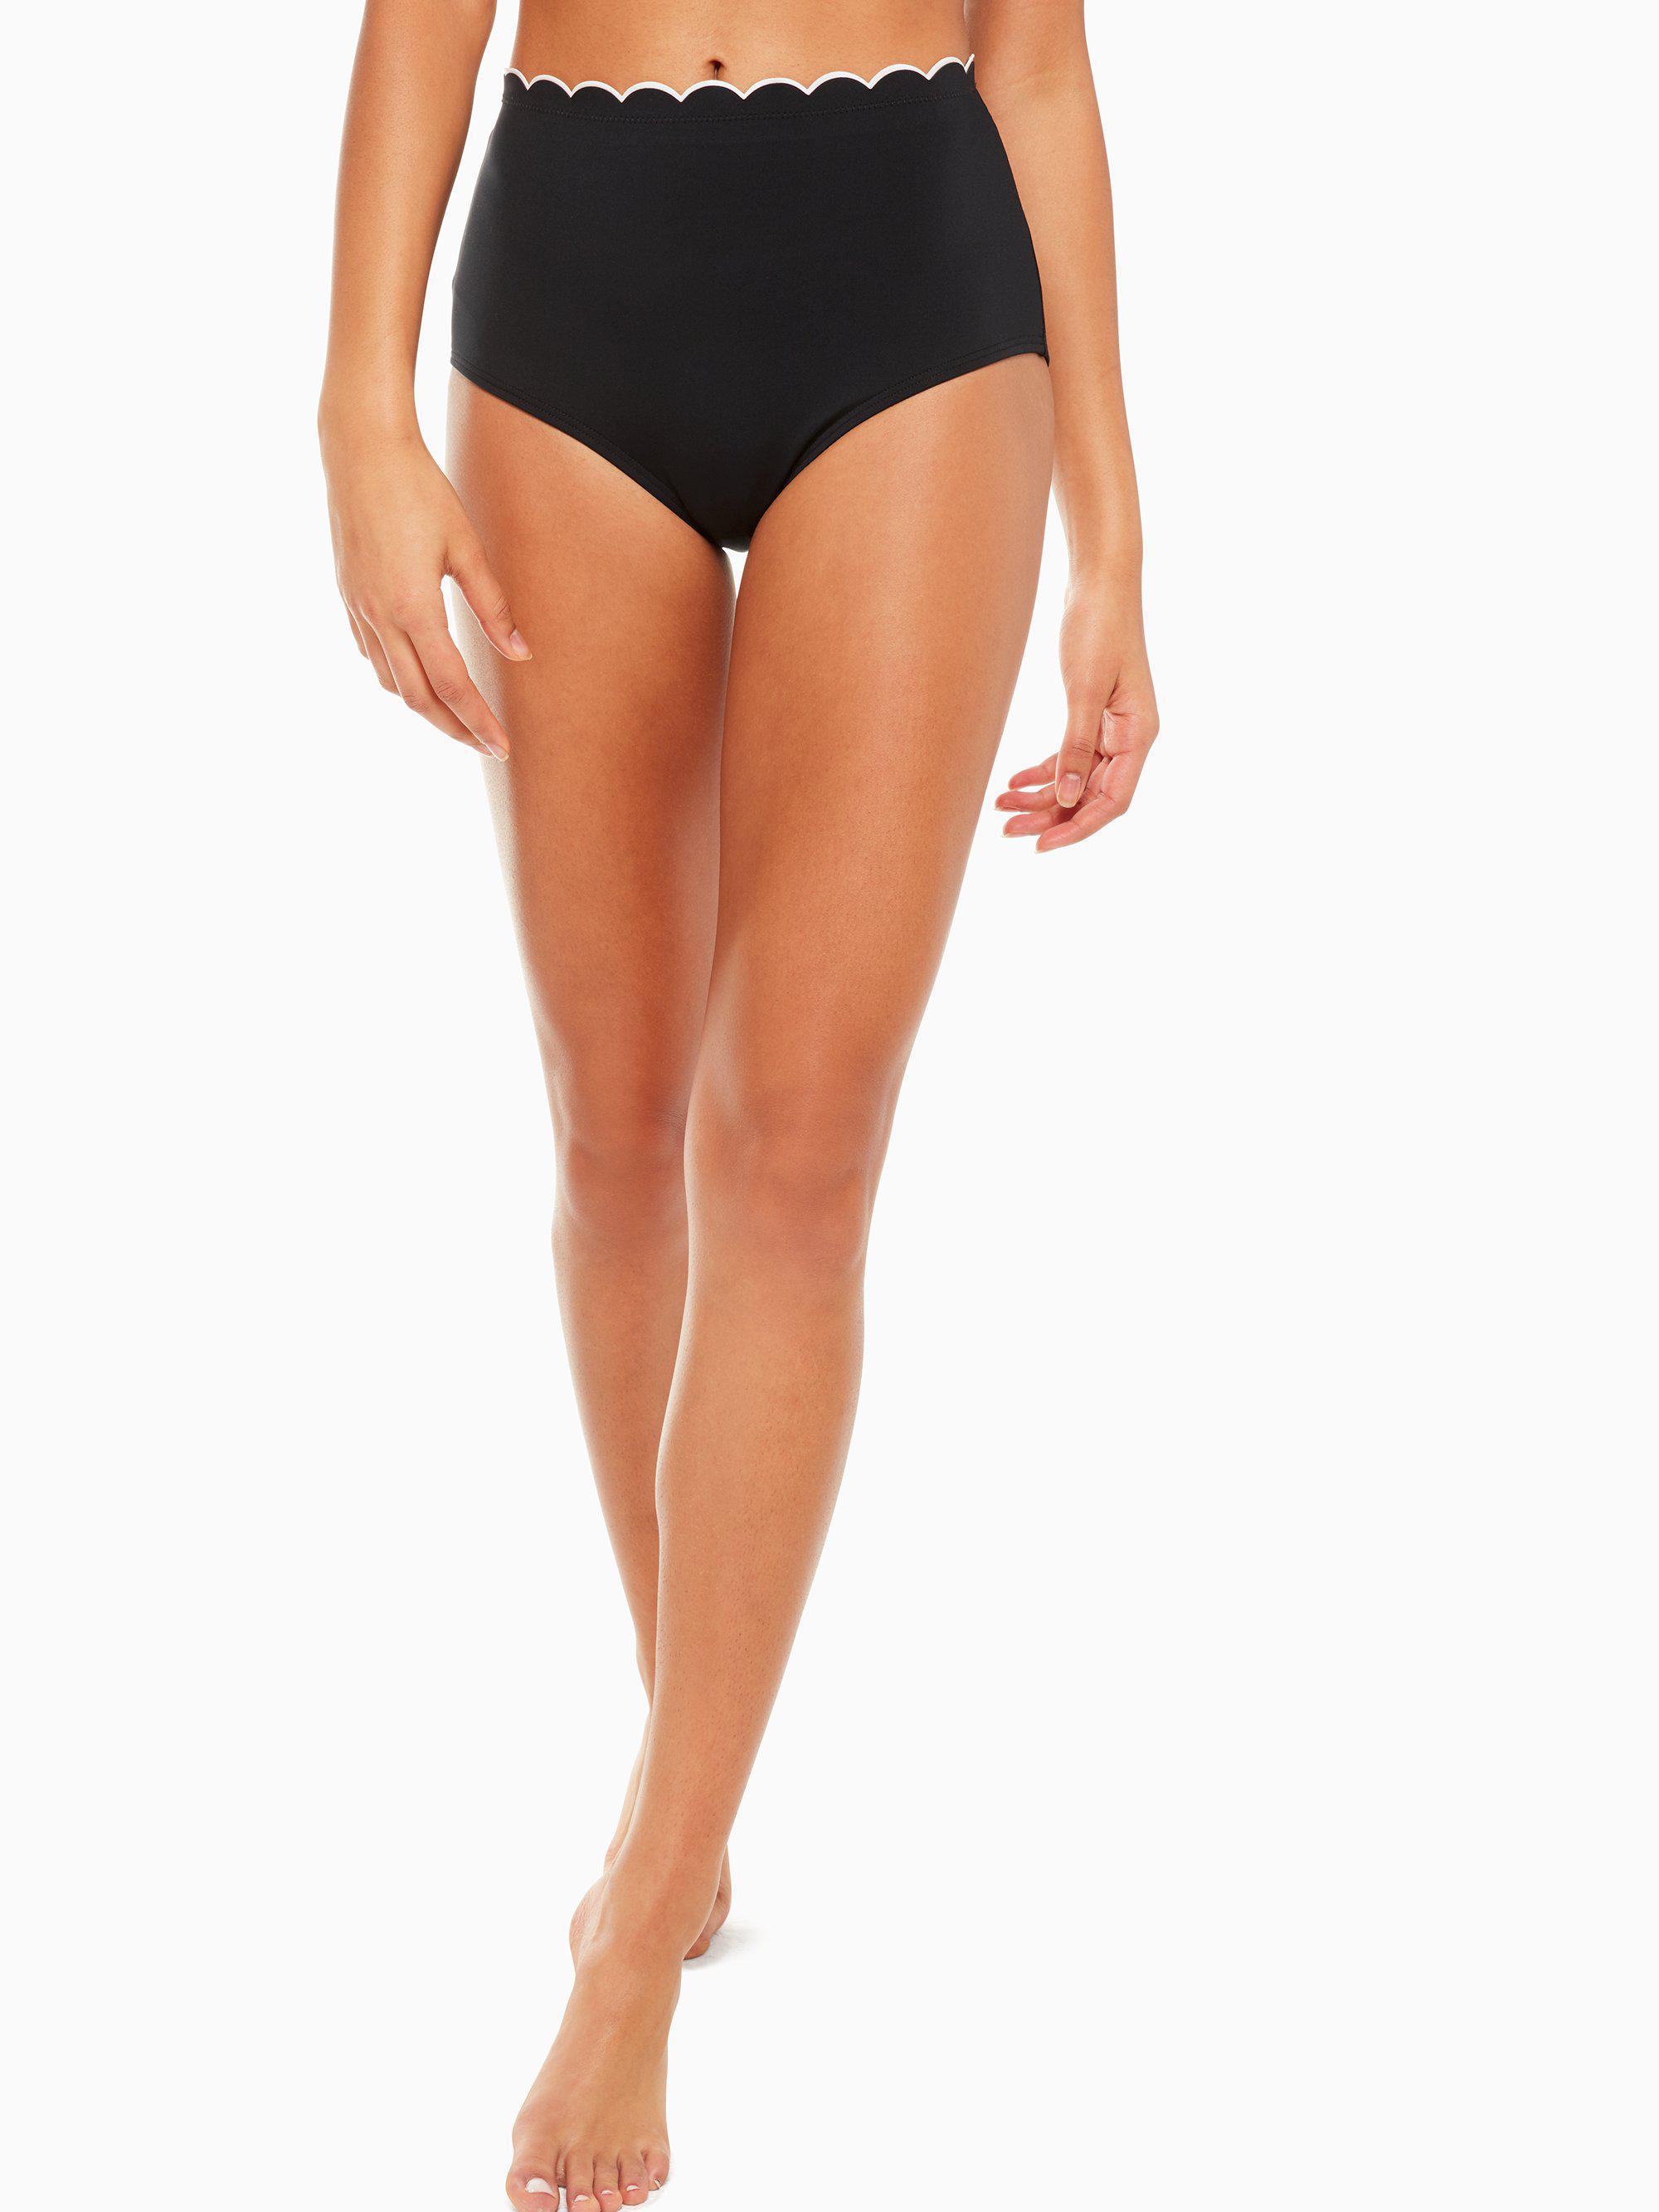 6e529f19ff1ee Kate Spade. Women s Black Fort Tilden Contrast Scalloped High Waist Bikini  Bottom.  80 From kate spade new york